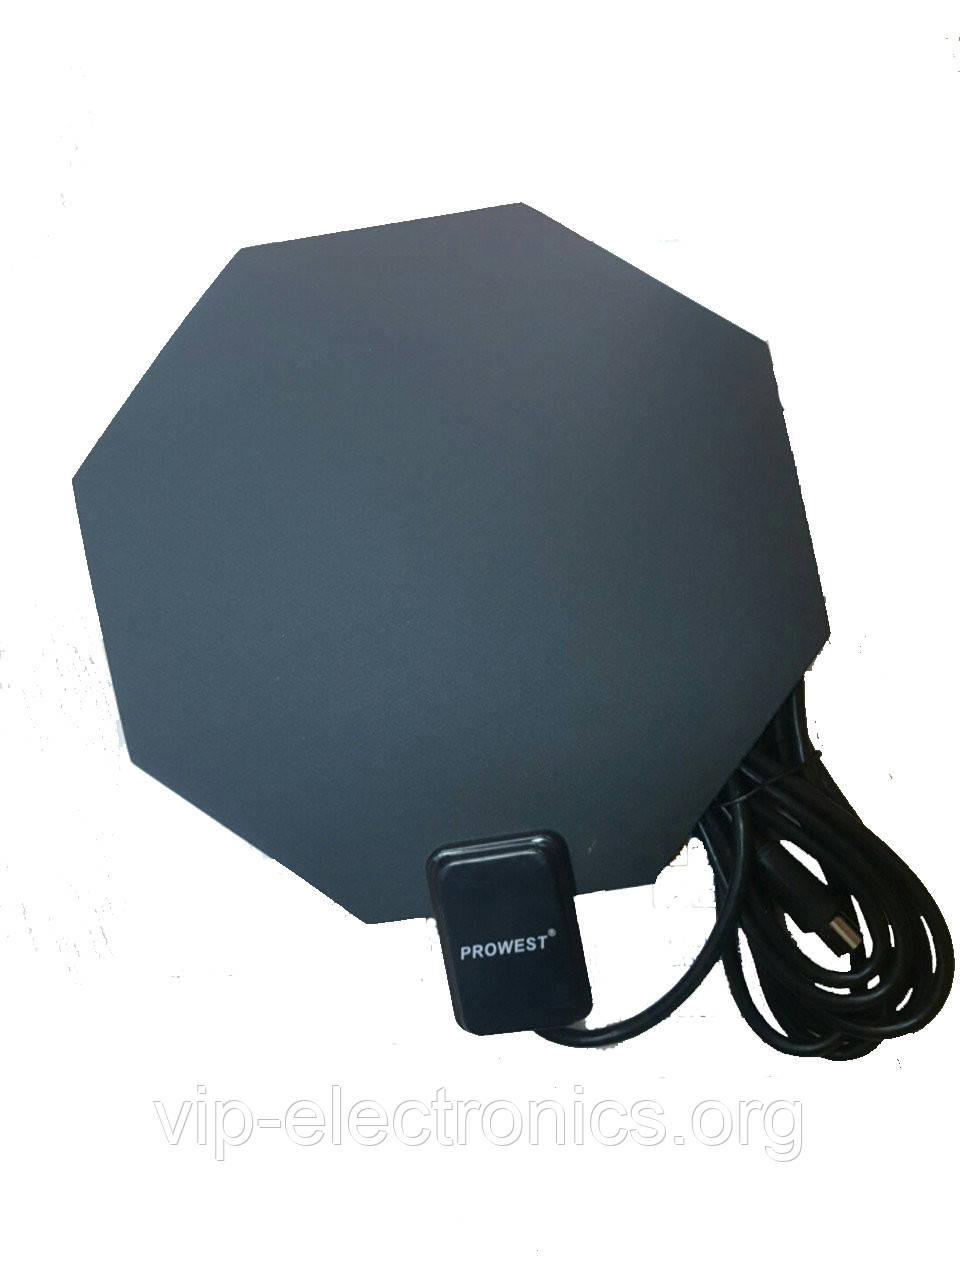 Антена 3,0138 DVB-T2  HDTV(470-860Мгц) цифрова  в коробці